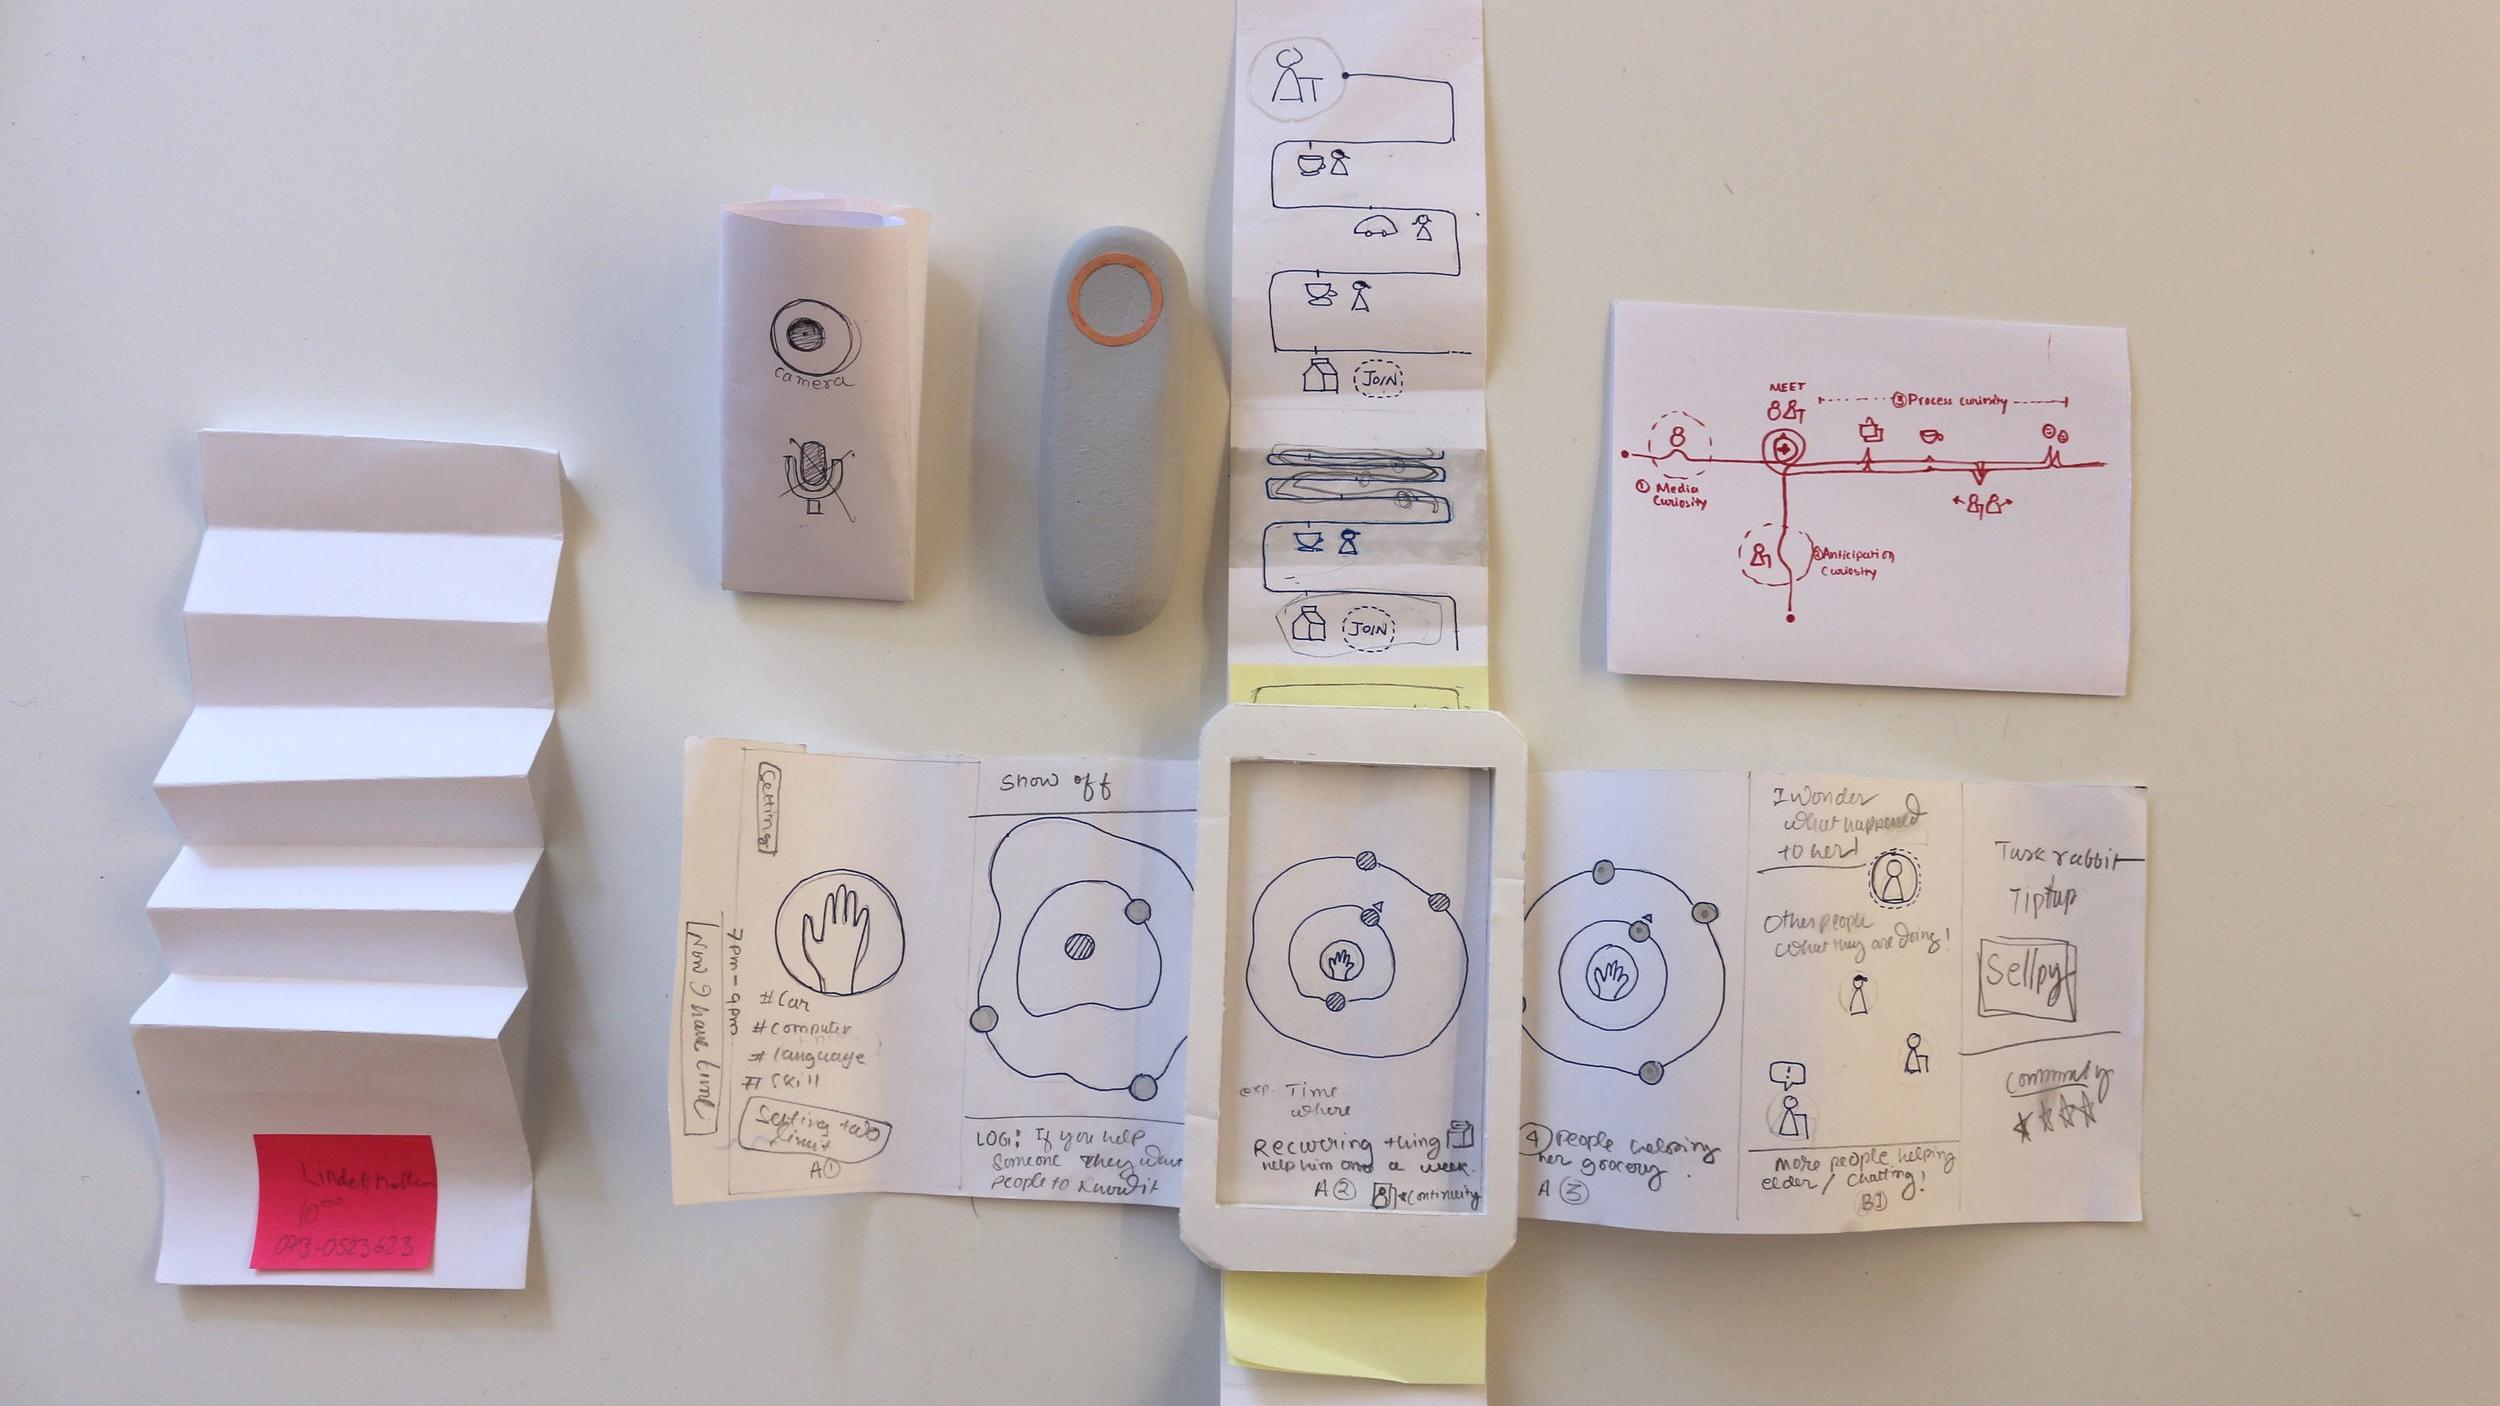 low fi prototyping